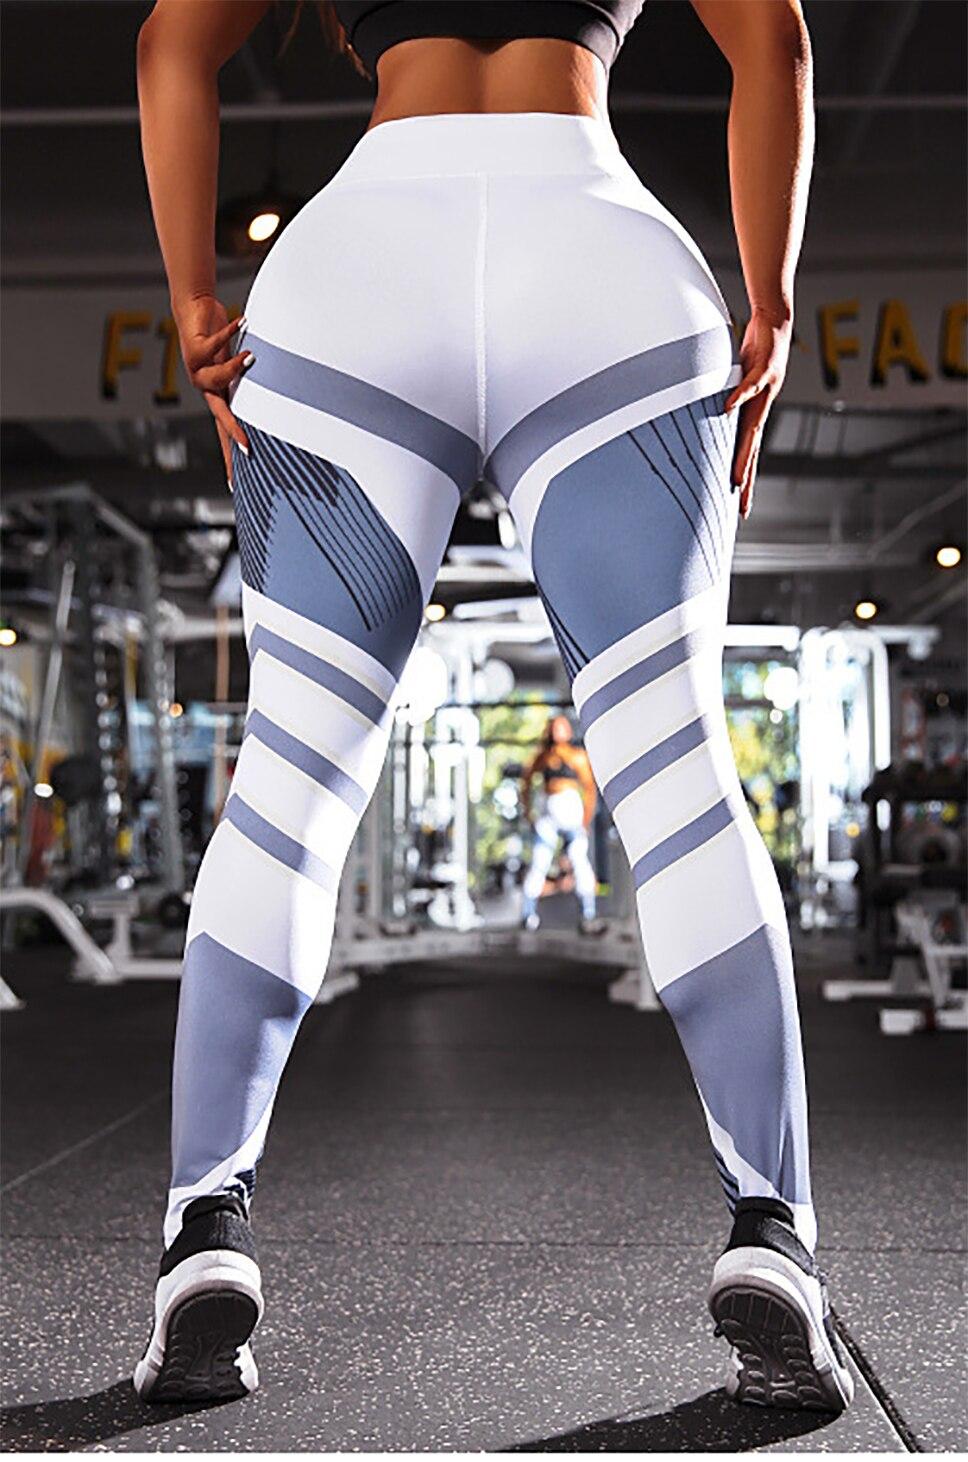 H2b6b6e4b30c74ad5951112fae750d5fcL BEFORW 2020 Fashion Polyester Digital Printing Leggings Plus Size Women Sexy Workout Black Leggings Camouflage Camo Pants